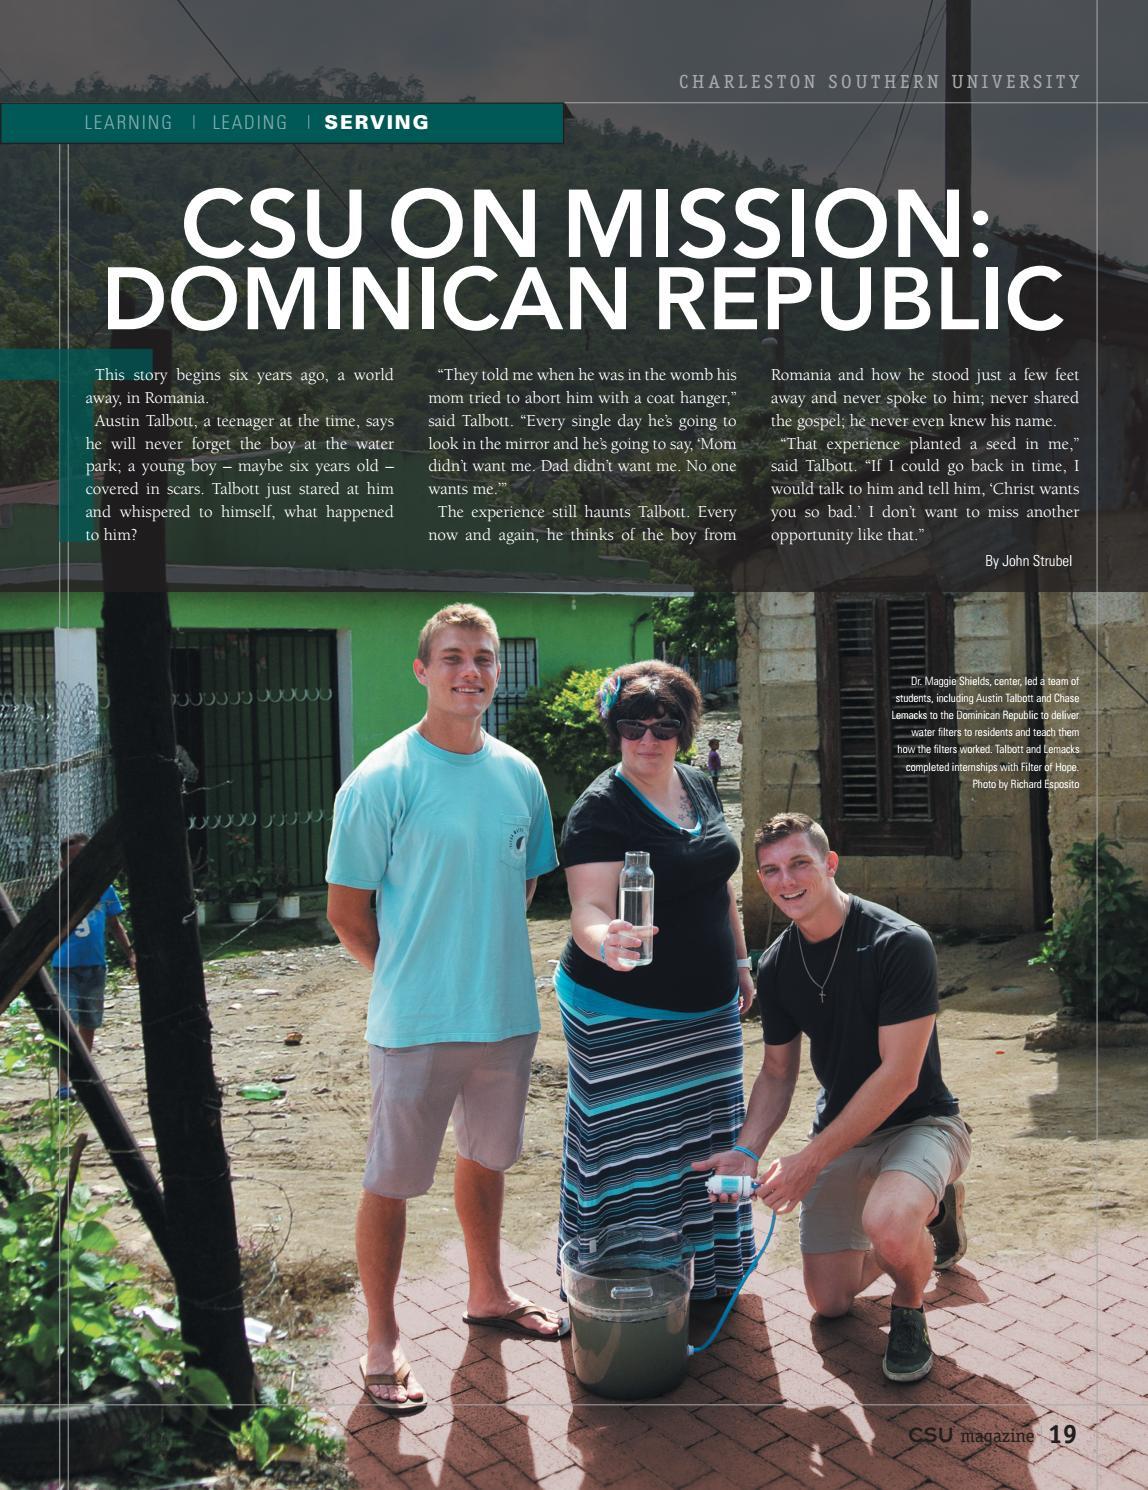 CSU magazine vol 26 no 3 by Bob Durand Design - issuu